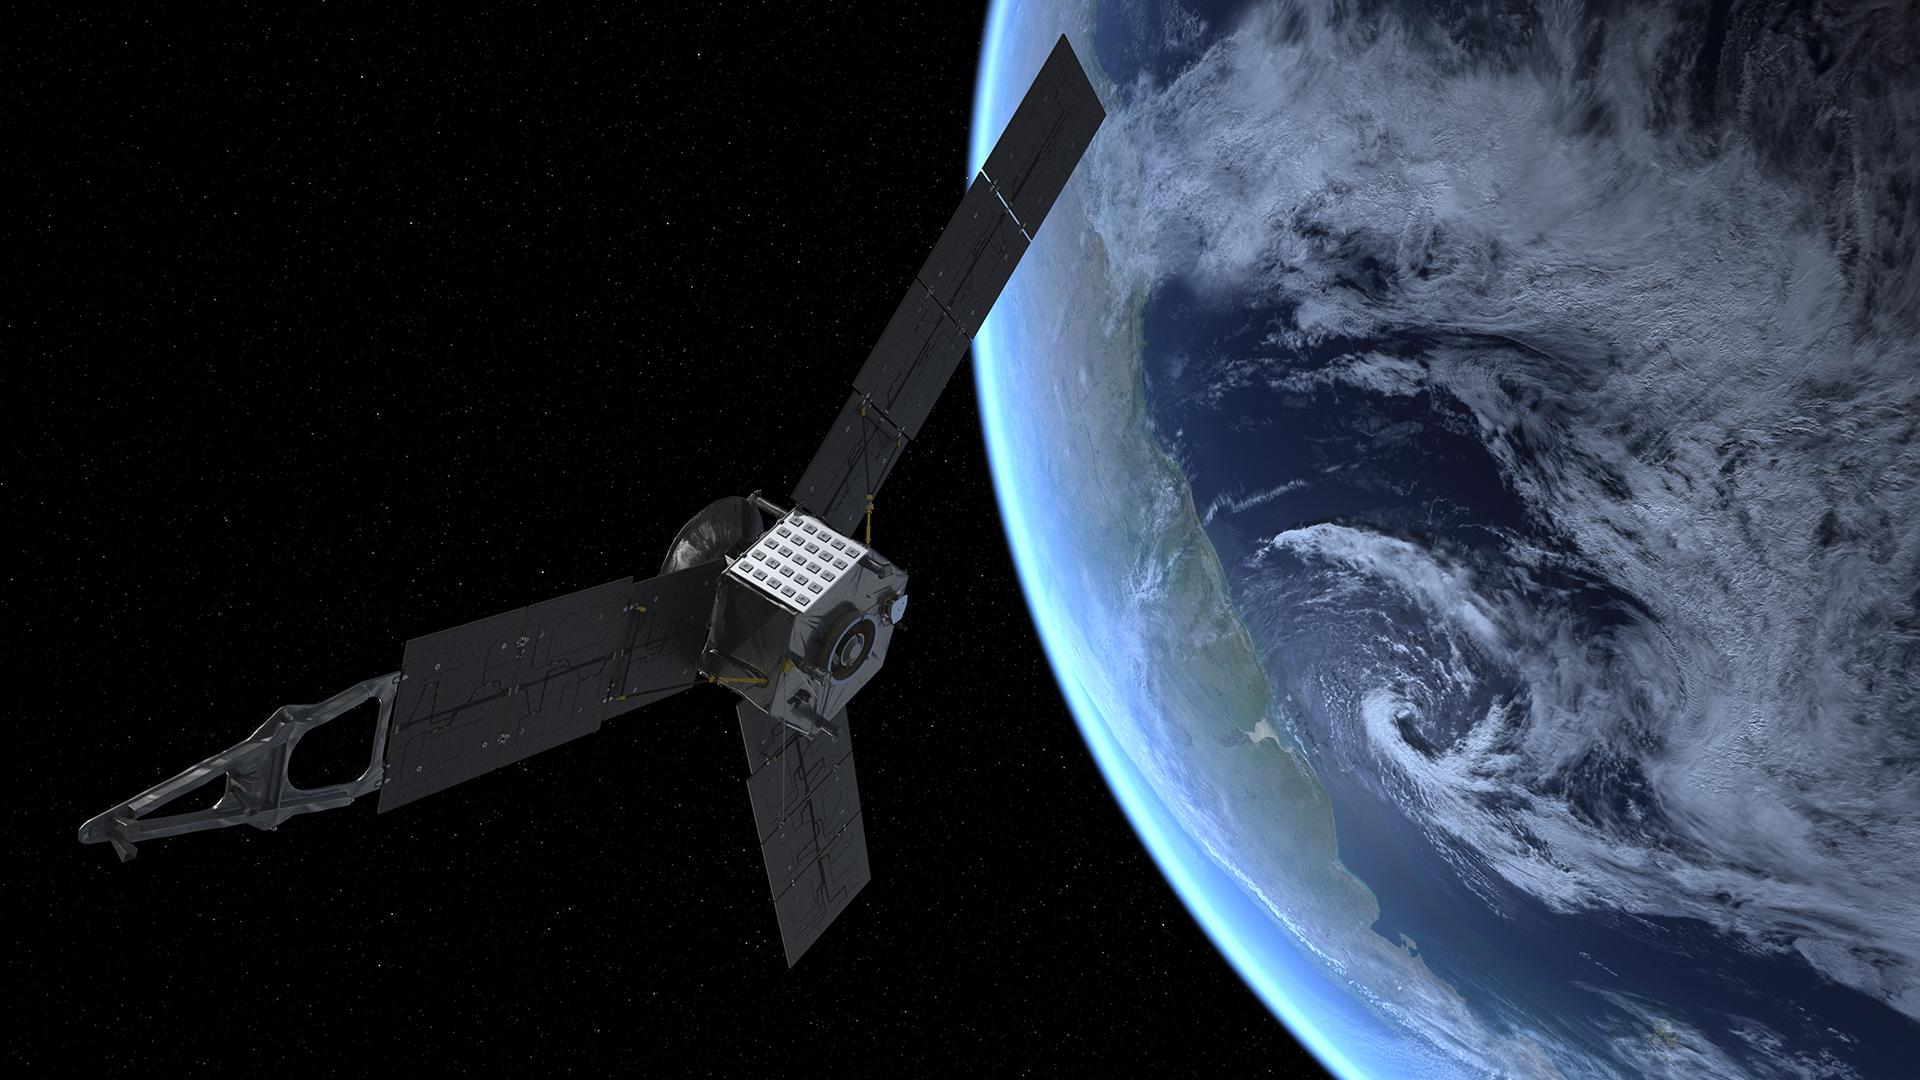 NASA probe set to make closest approach yet to Jupiter